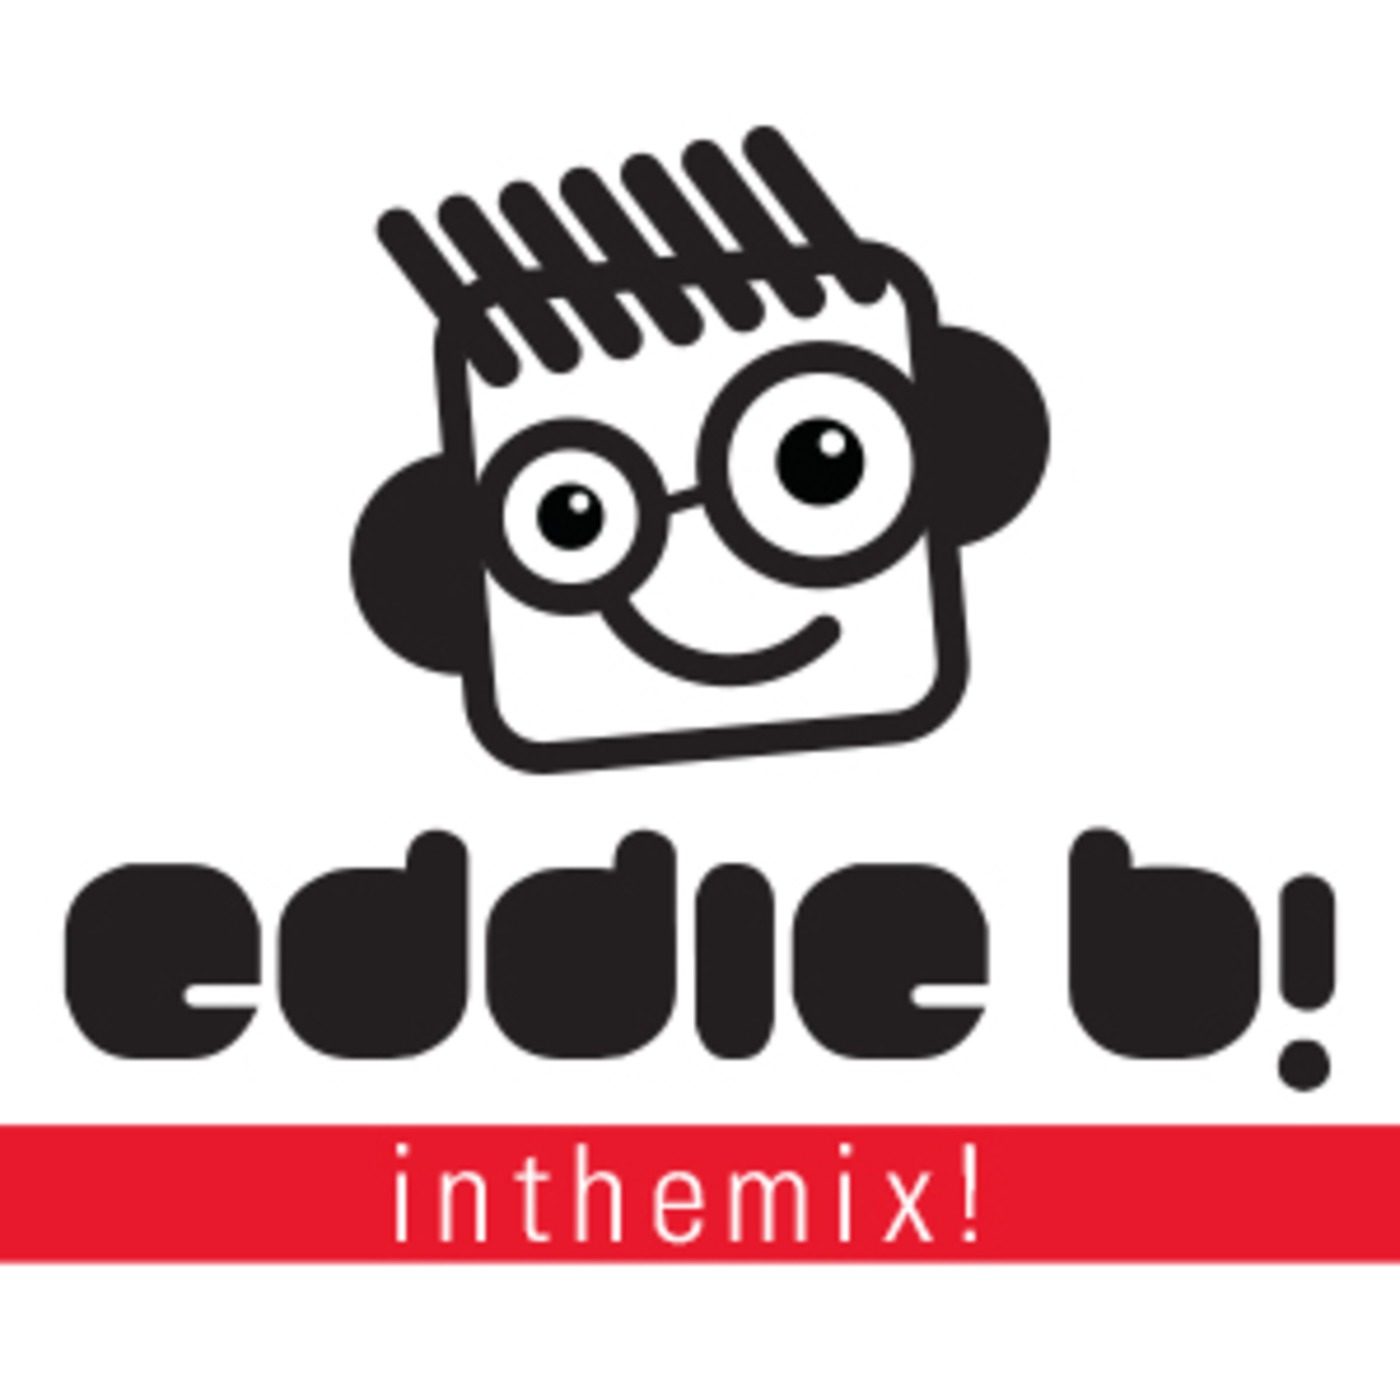 Eddie B! Inthemix!